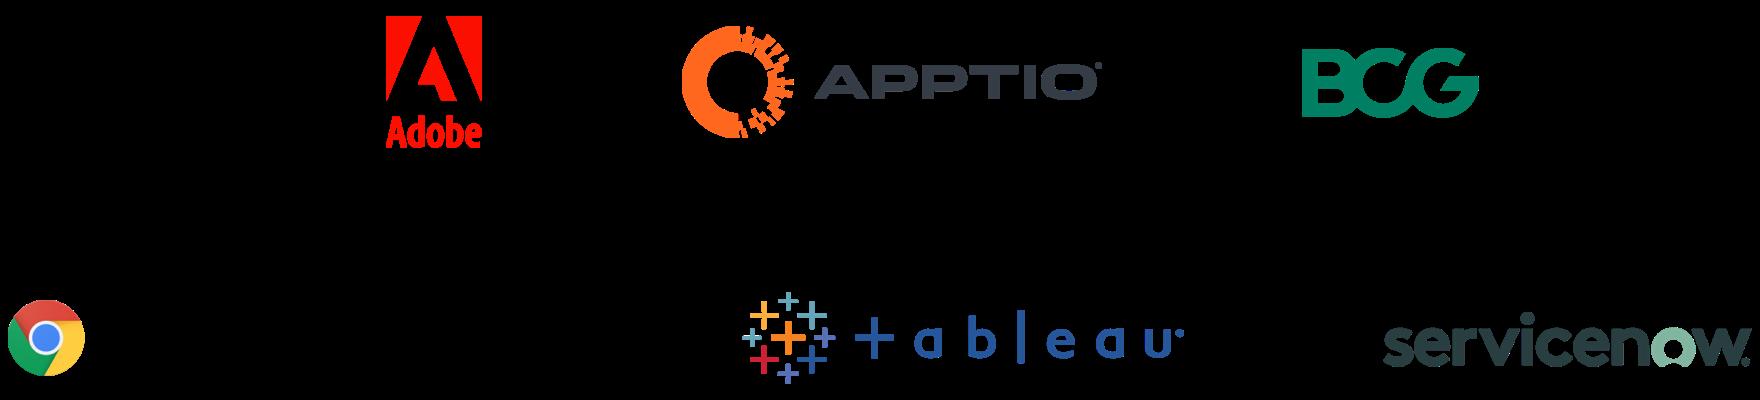 adobe/apptio/bcg/chrome/tableau/servicenow